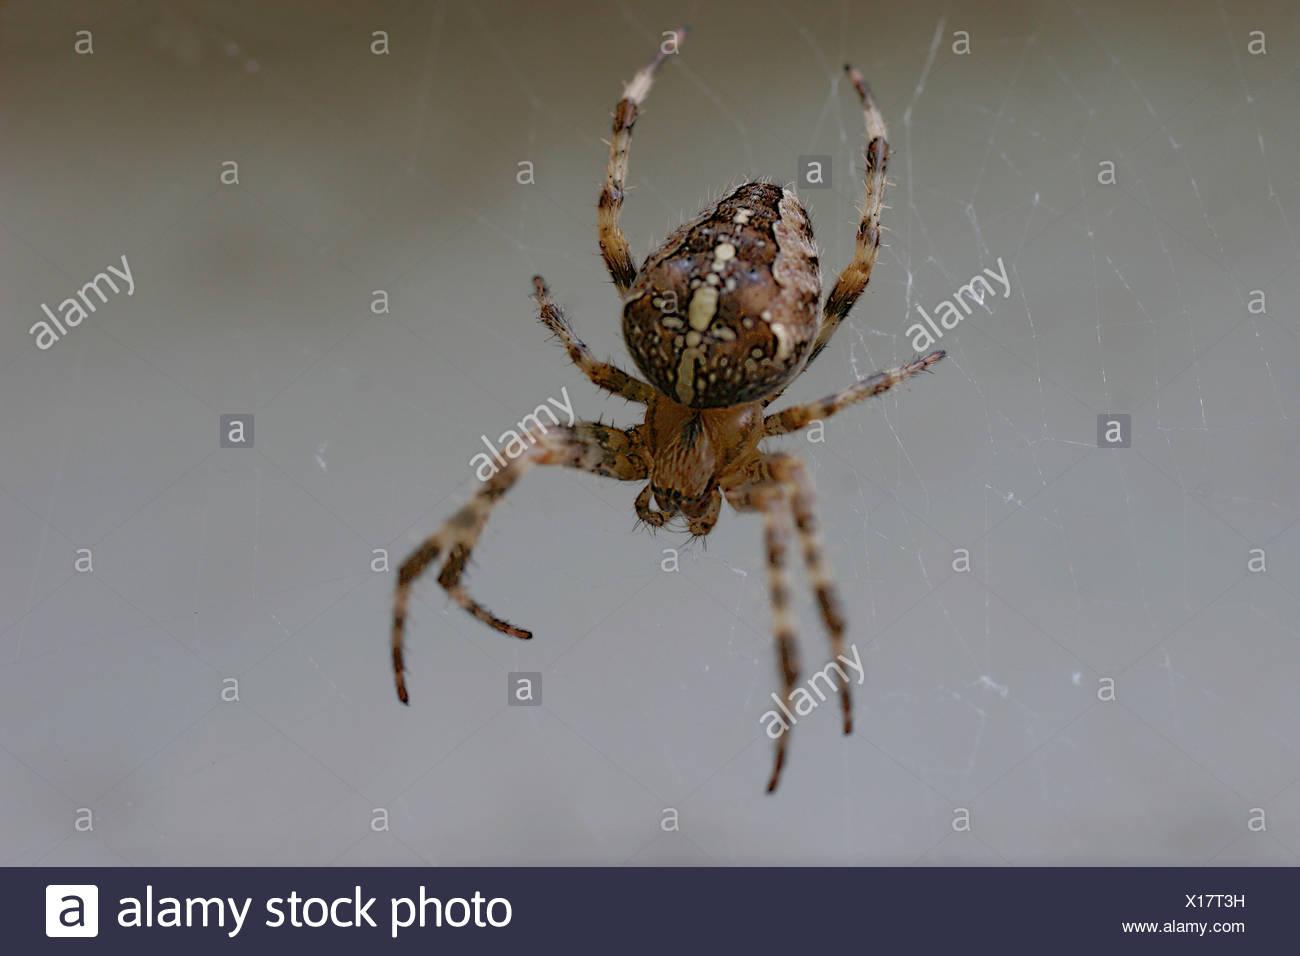 Cross-spider Araneus diadematus fuzziness nature animal spider arachnid Webspinne wheel-net-spider Araneidae concept fear fears - Stock Image